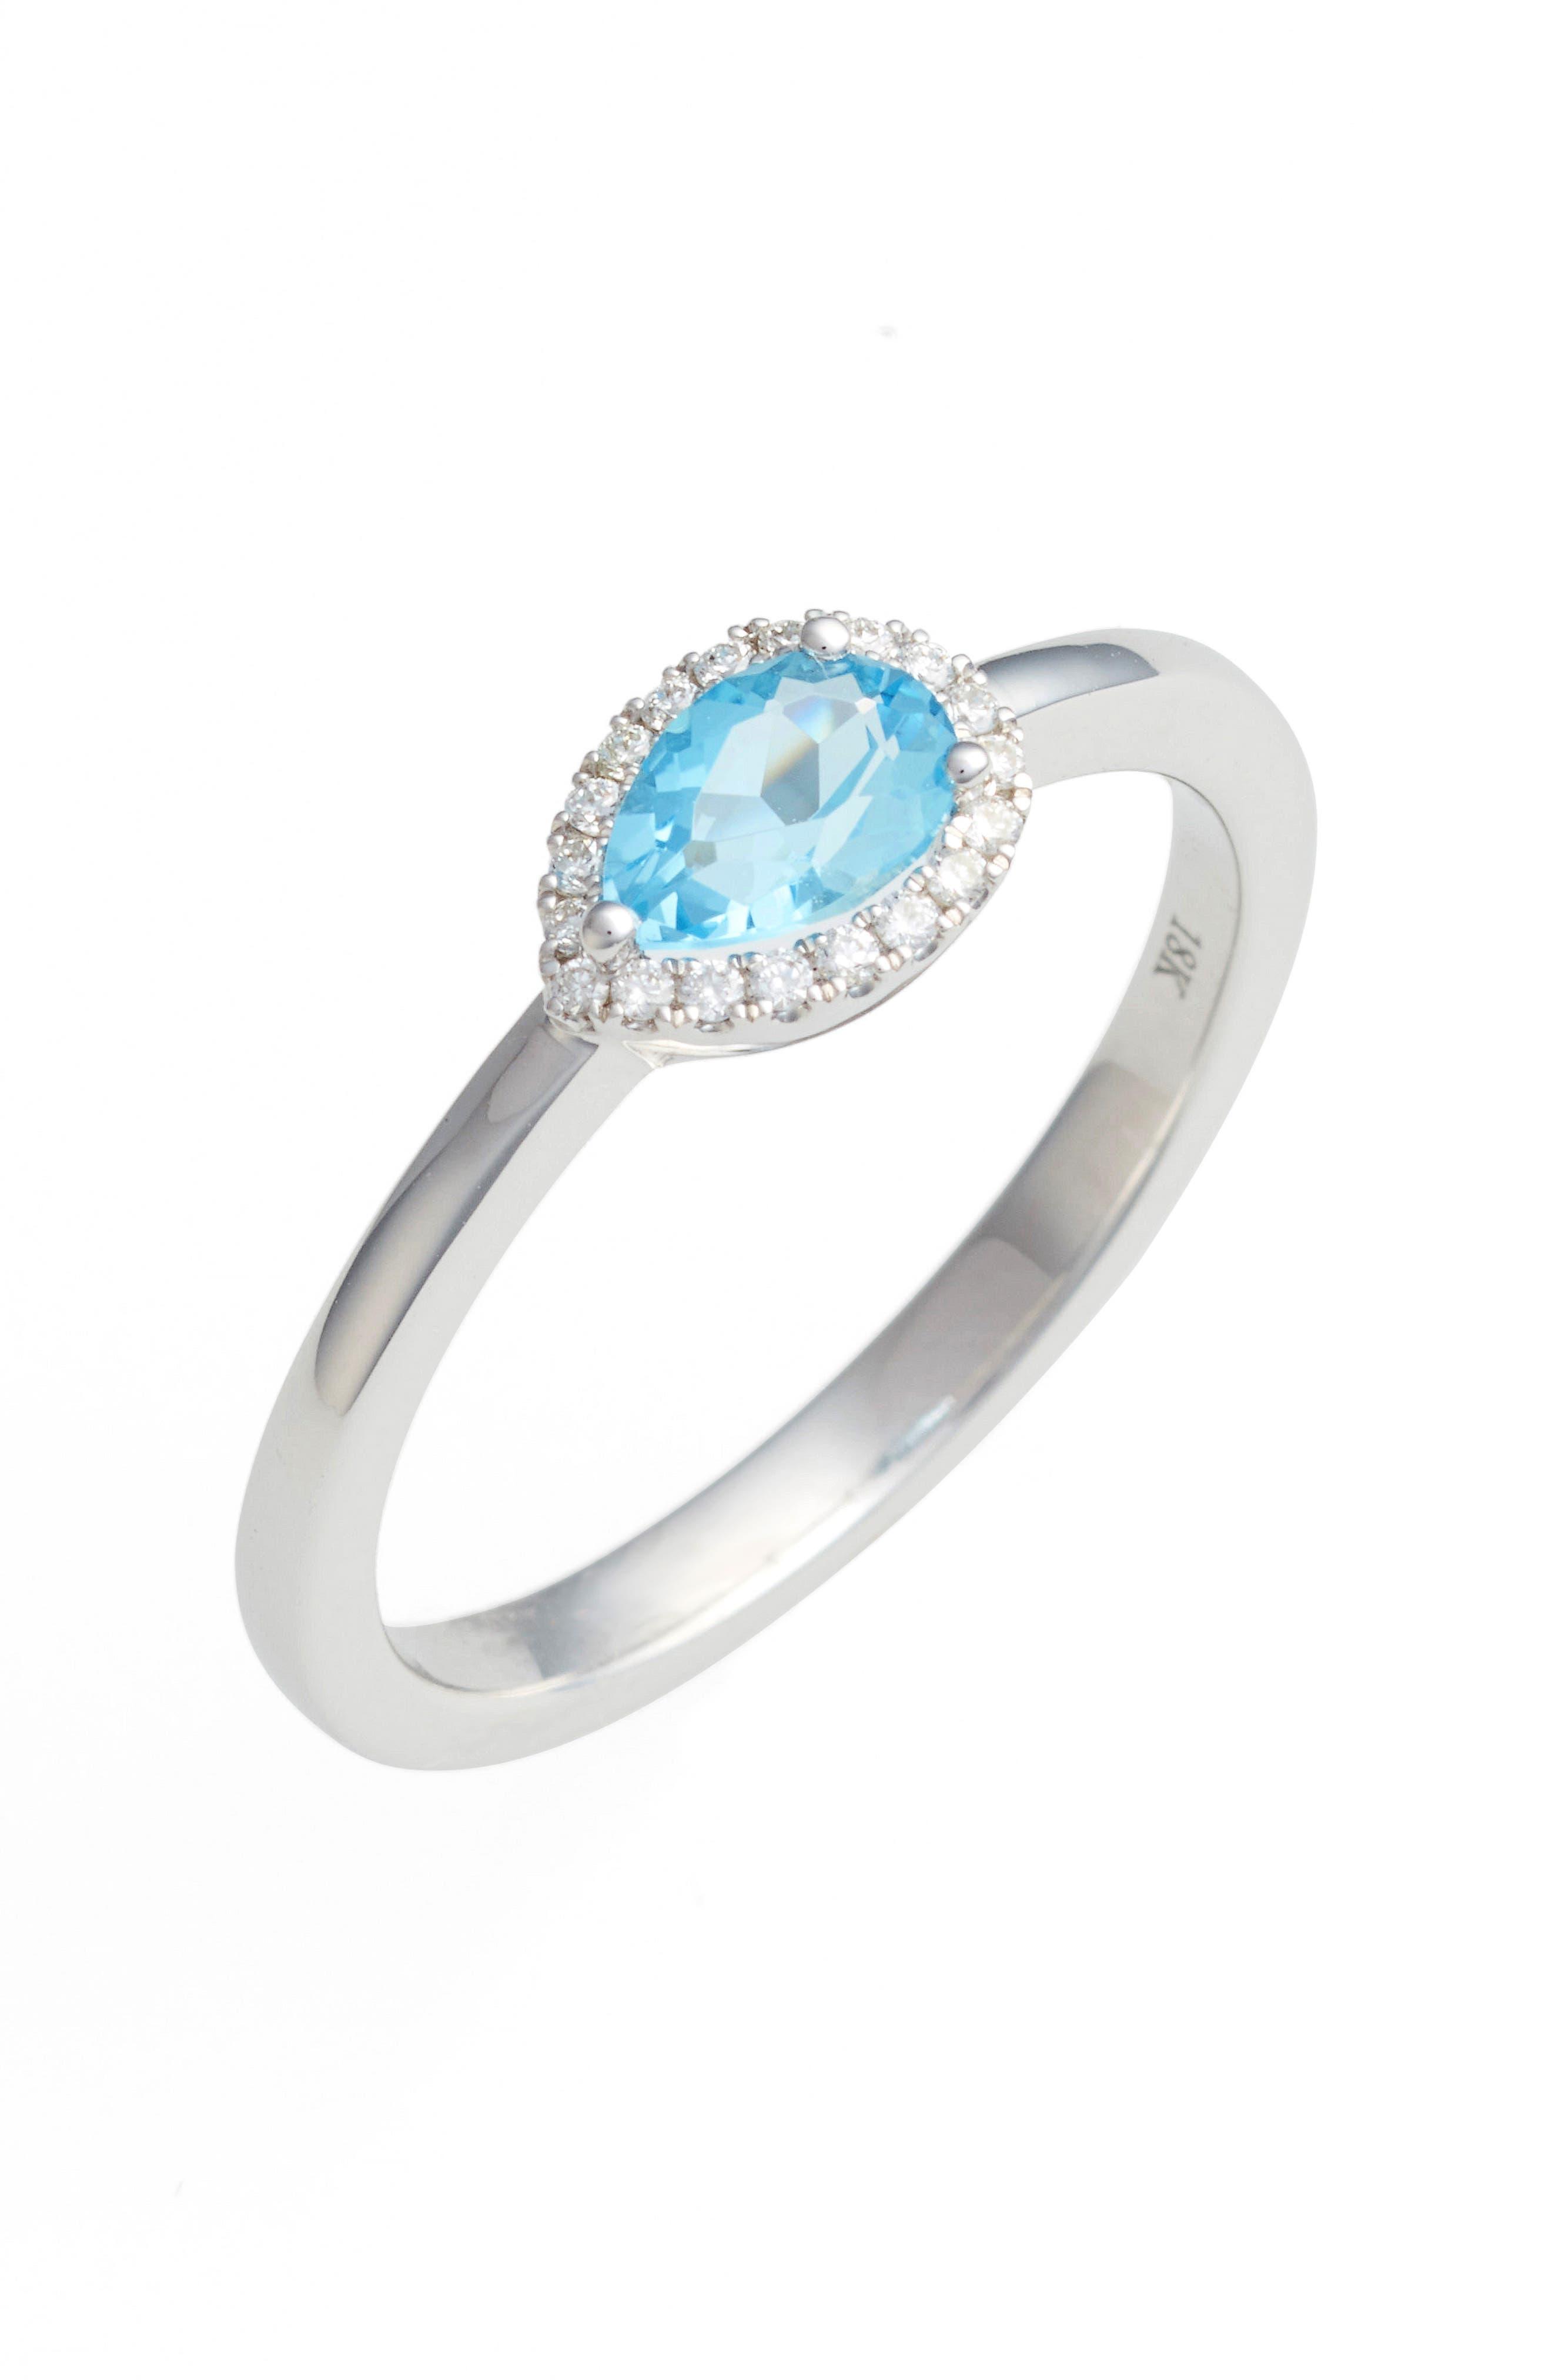 Alternate Image 1 Selected - Bony Levy Iris Diamond & Semiprecious Stone Teardrop Ring (Nordstrom Exclusive)